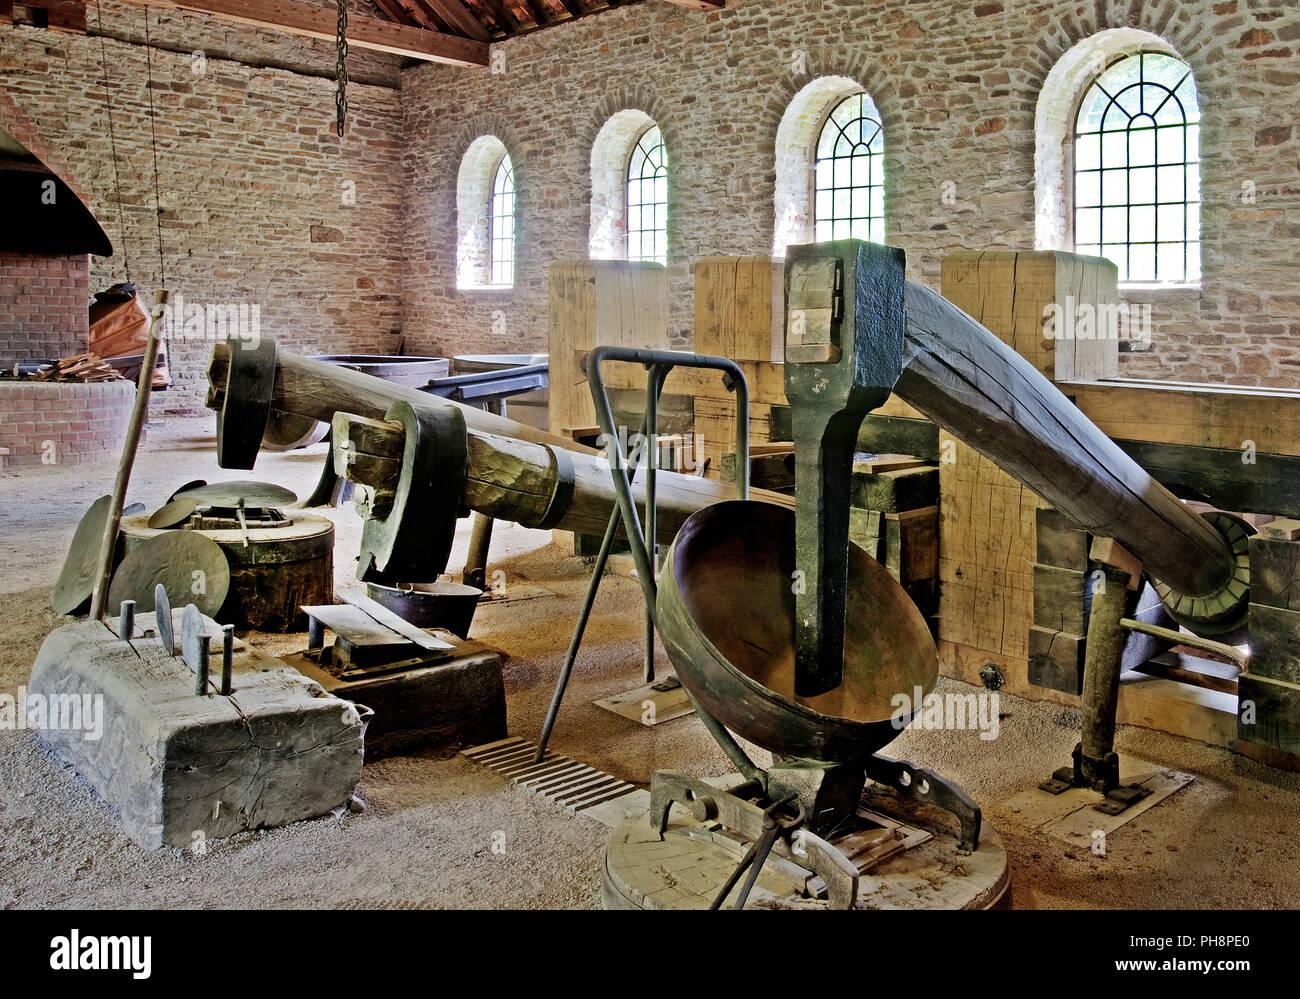 trip hammer of Hagen Open-air Museum, Germany - Stock Image